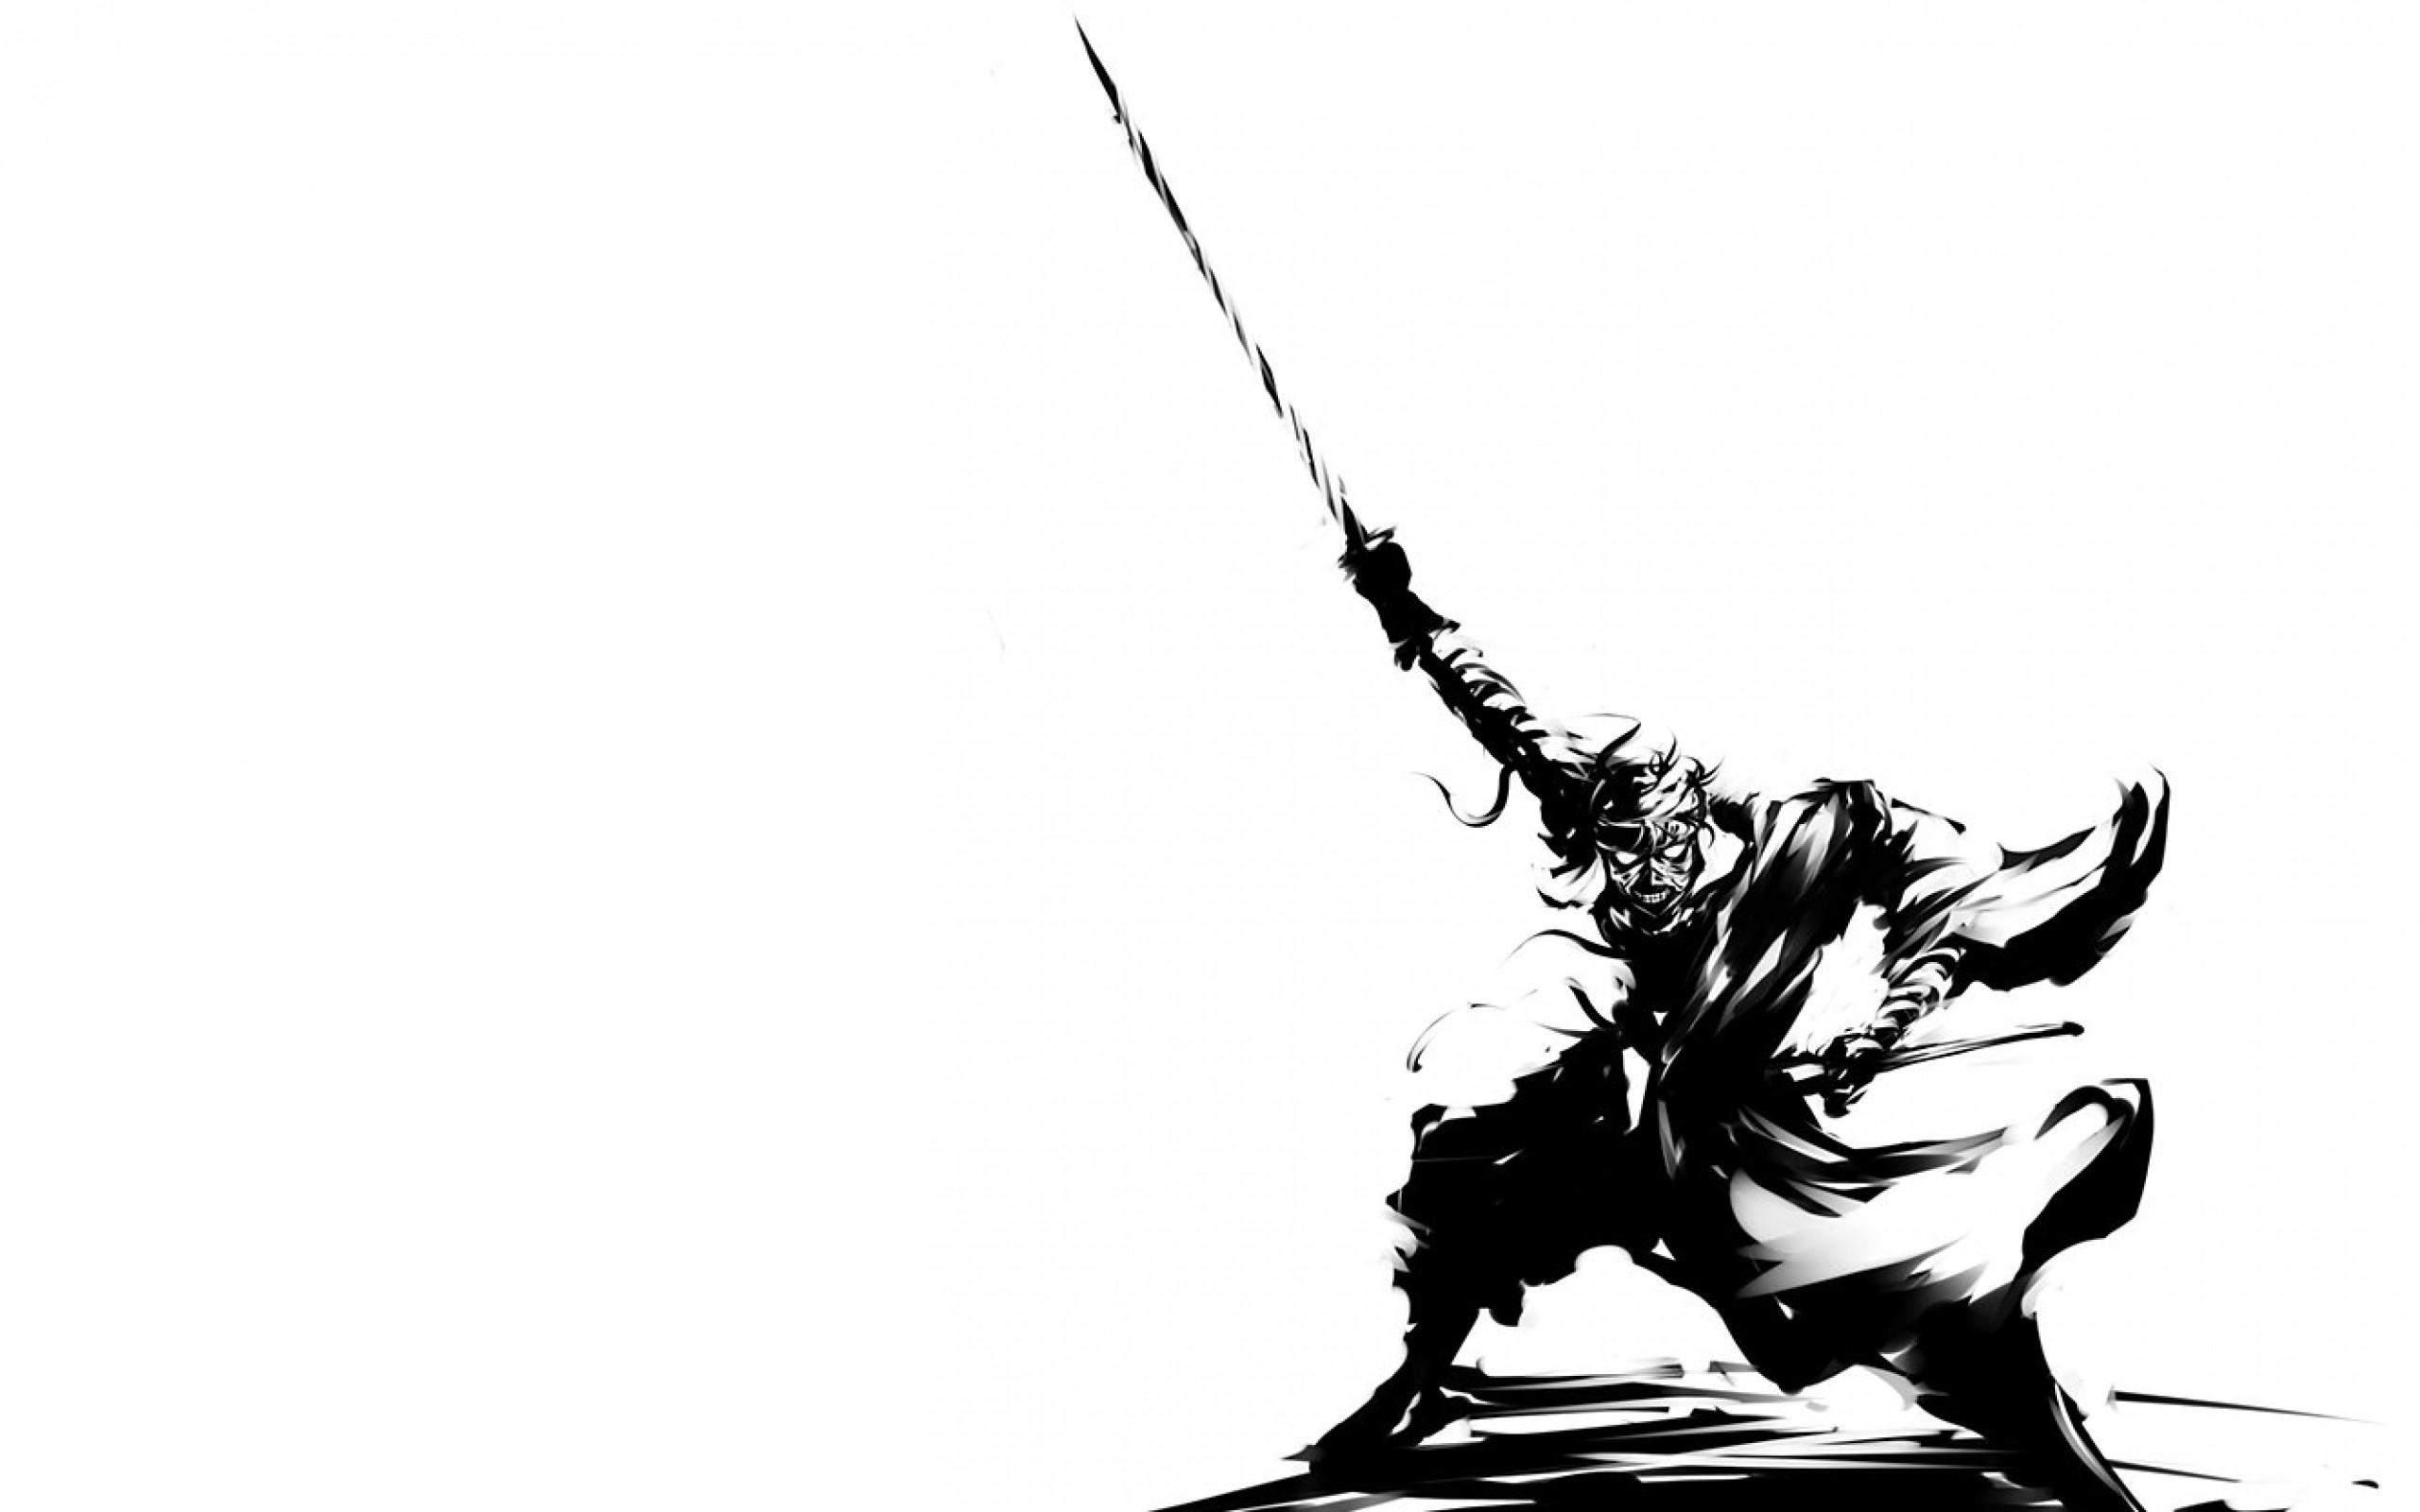 black and white rurouni kenshin samurai mummy grayscale monochrome warriors  anime swords white backg Wallpaper HD